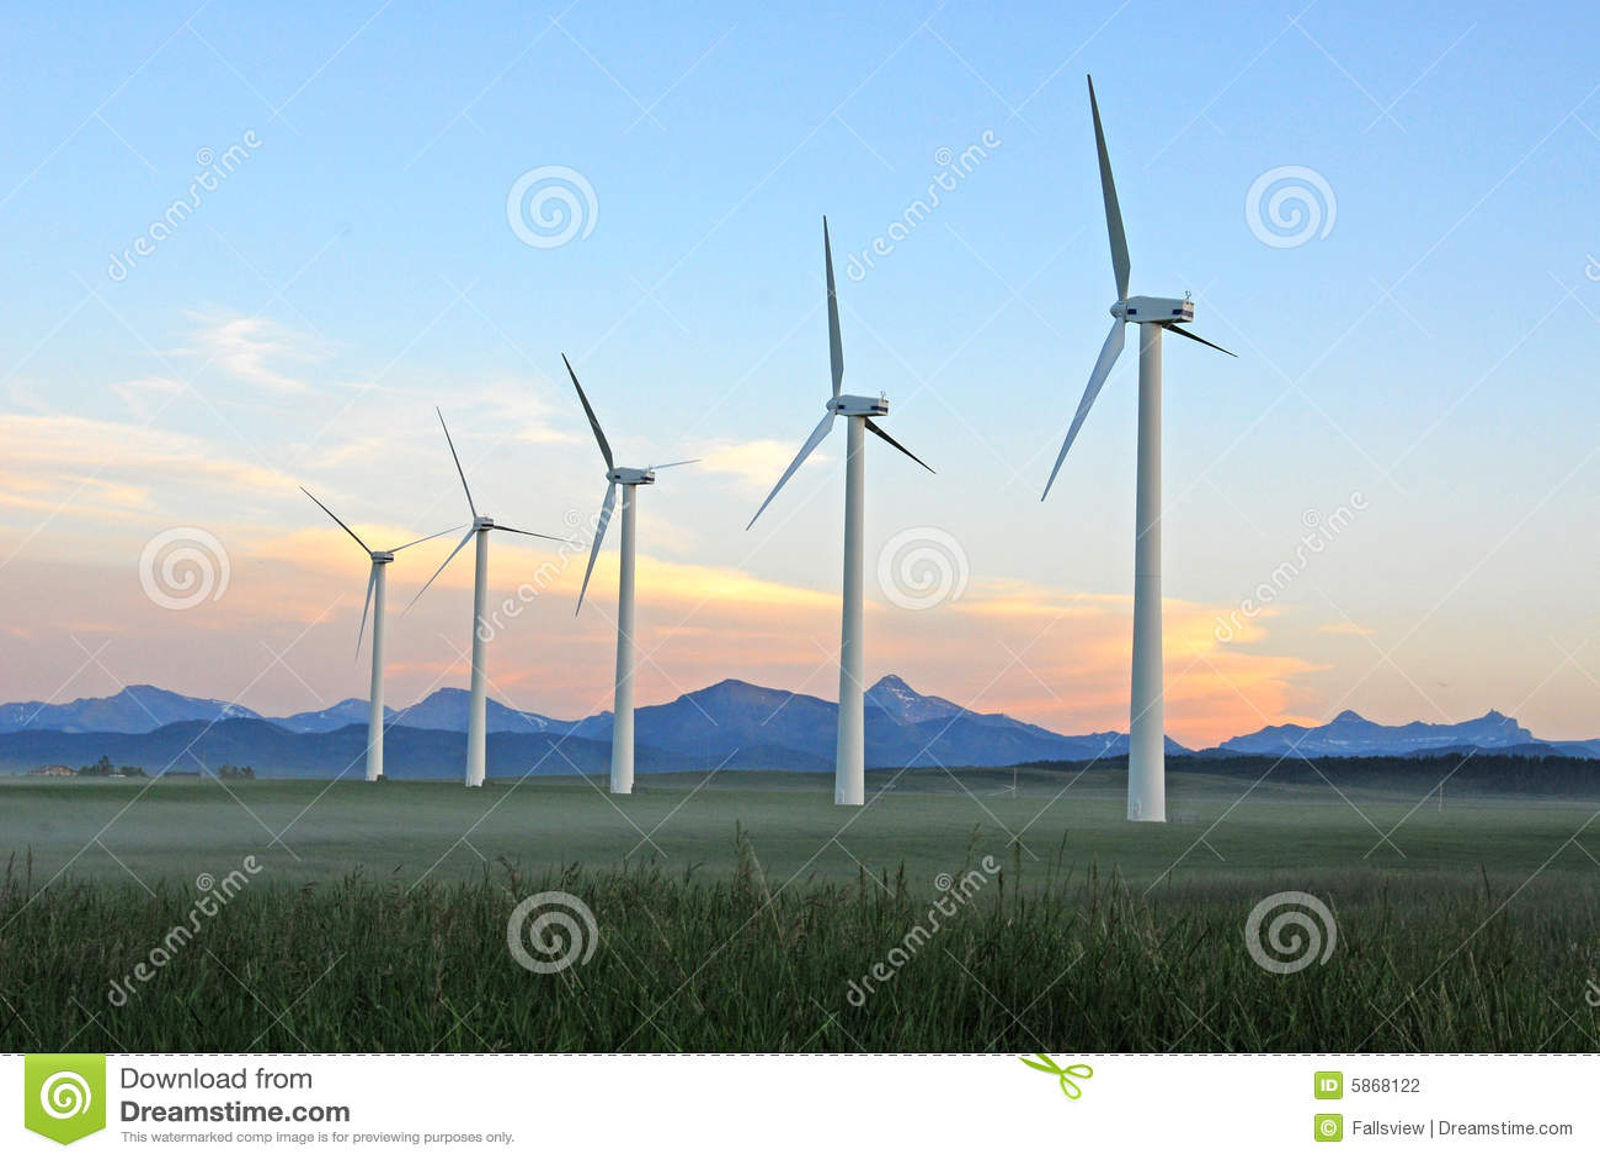 Windmolens bij schemer